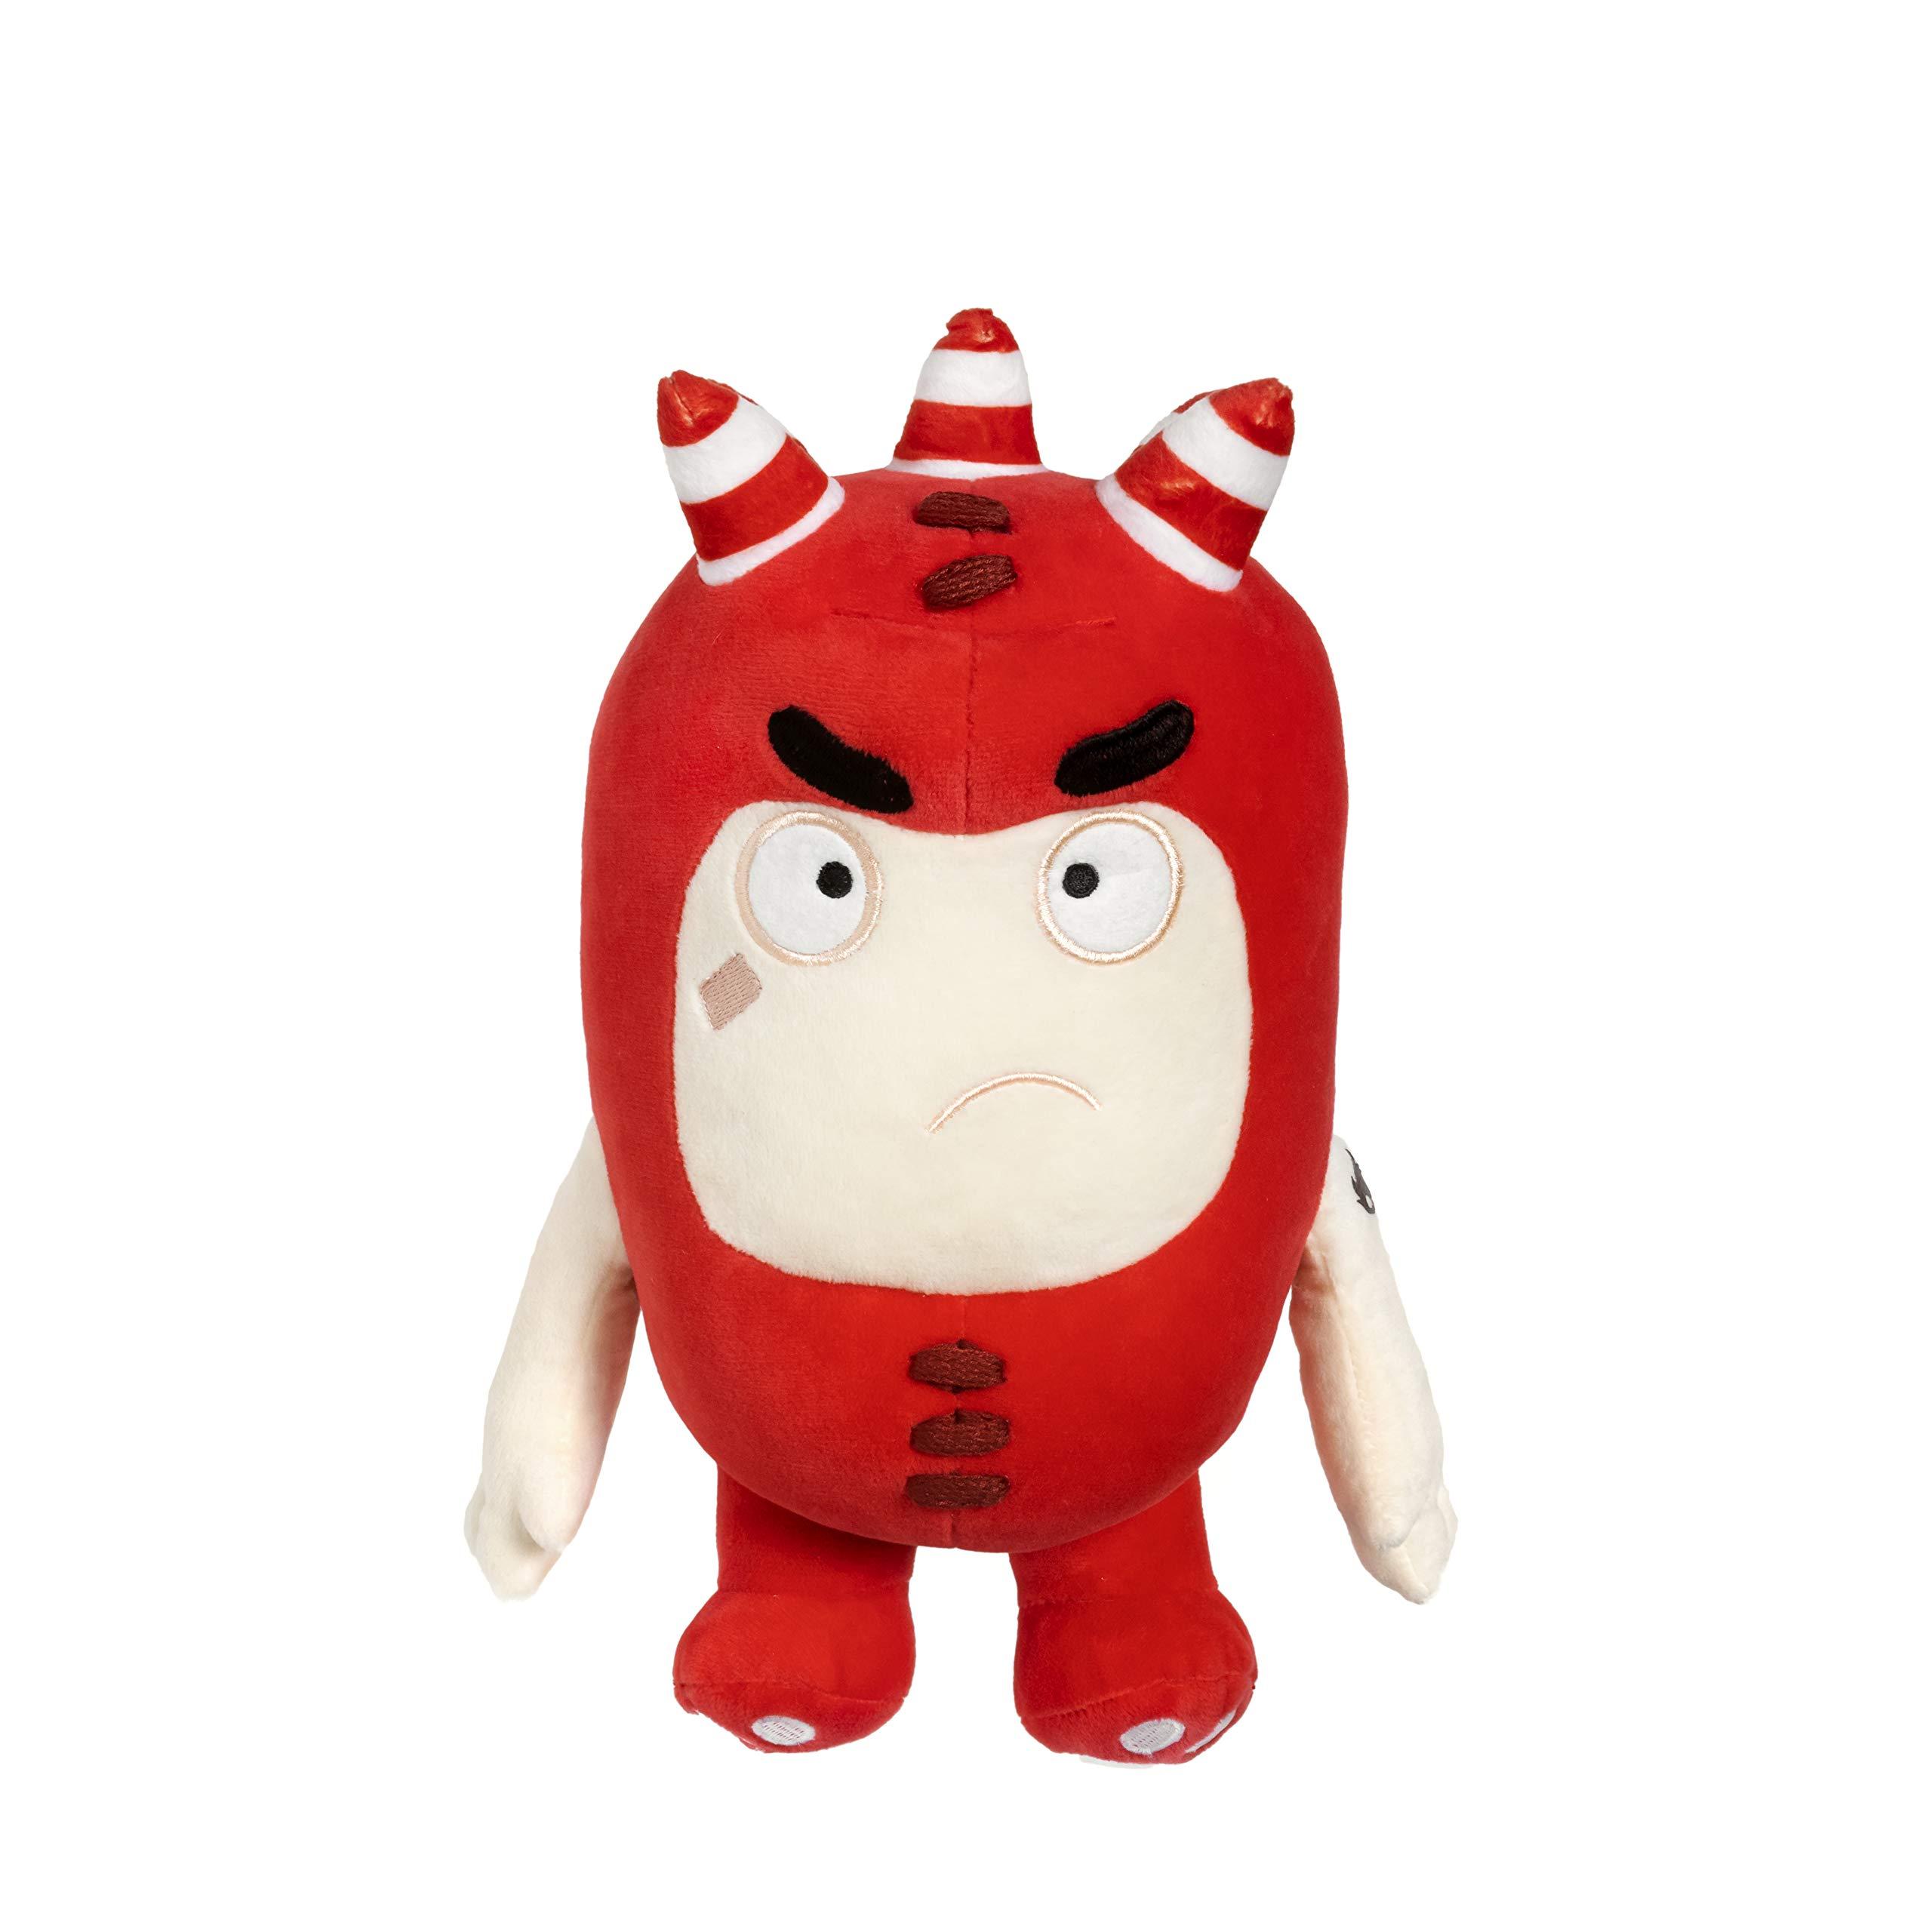 ODDBODS Fuse Plush | 12'' Red Soft Toy Idea for Kids by ODDBODS